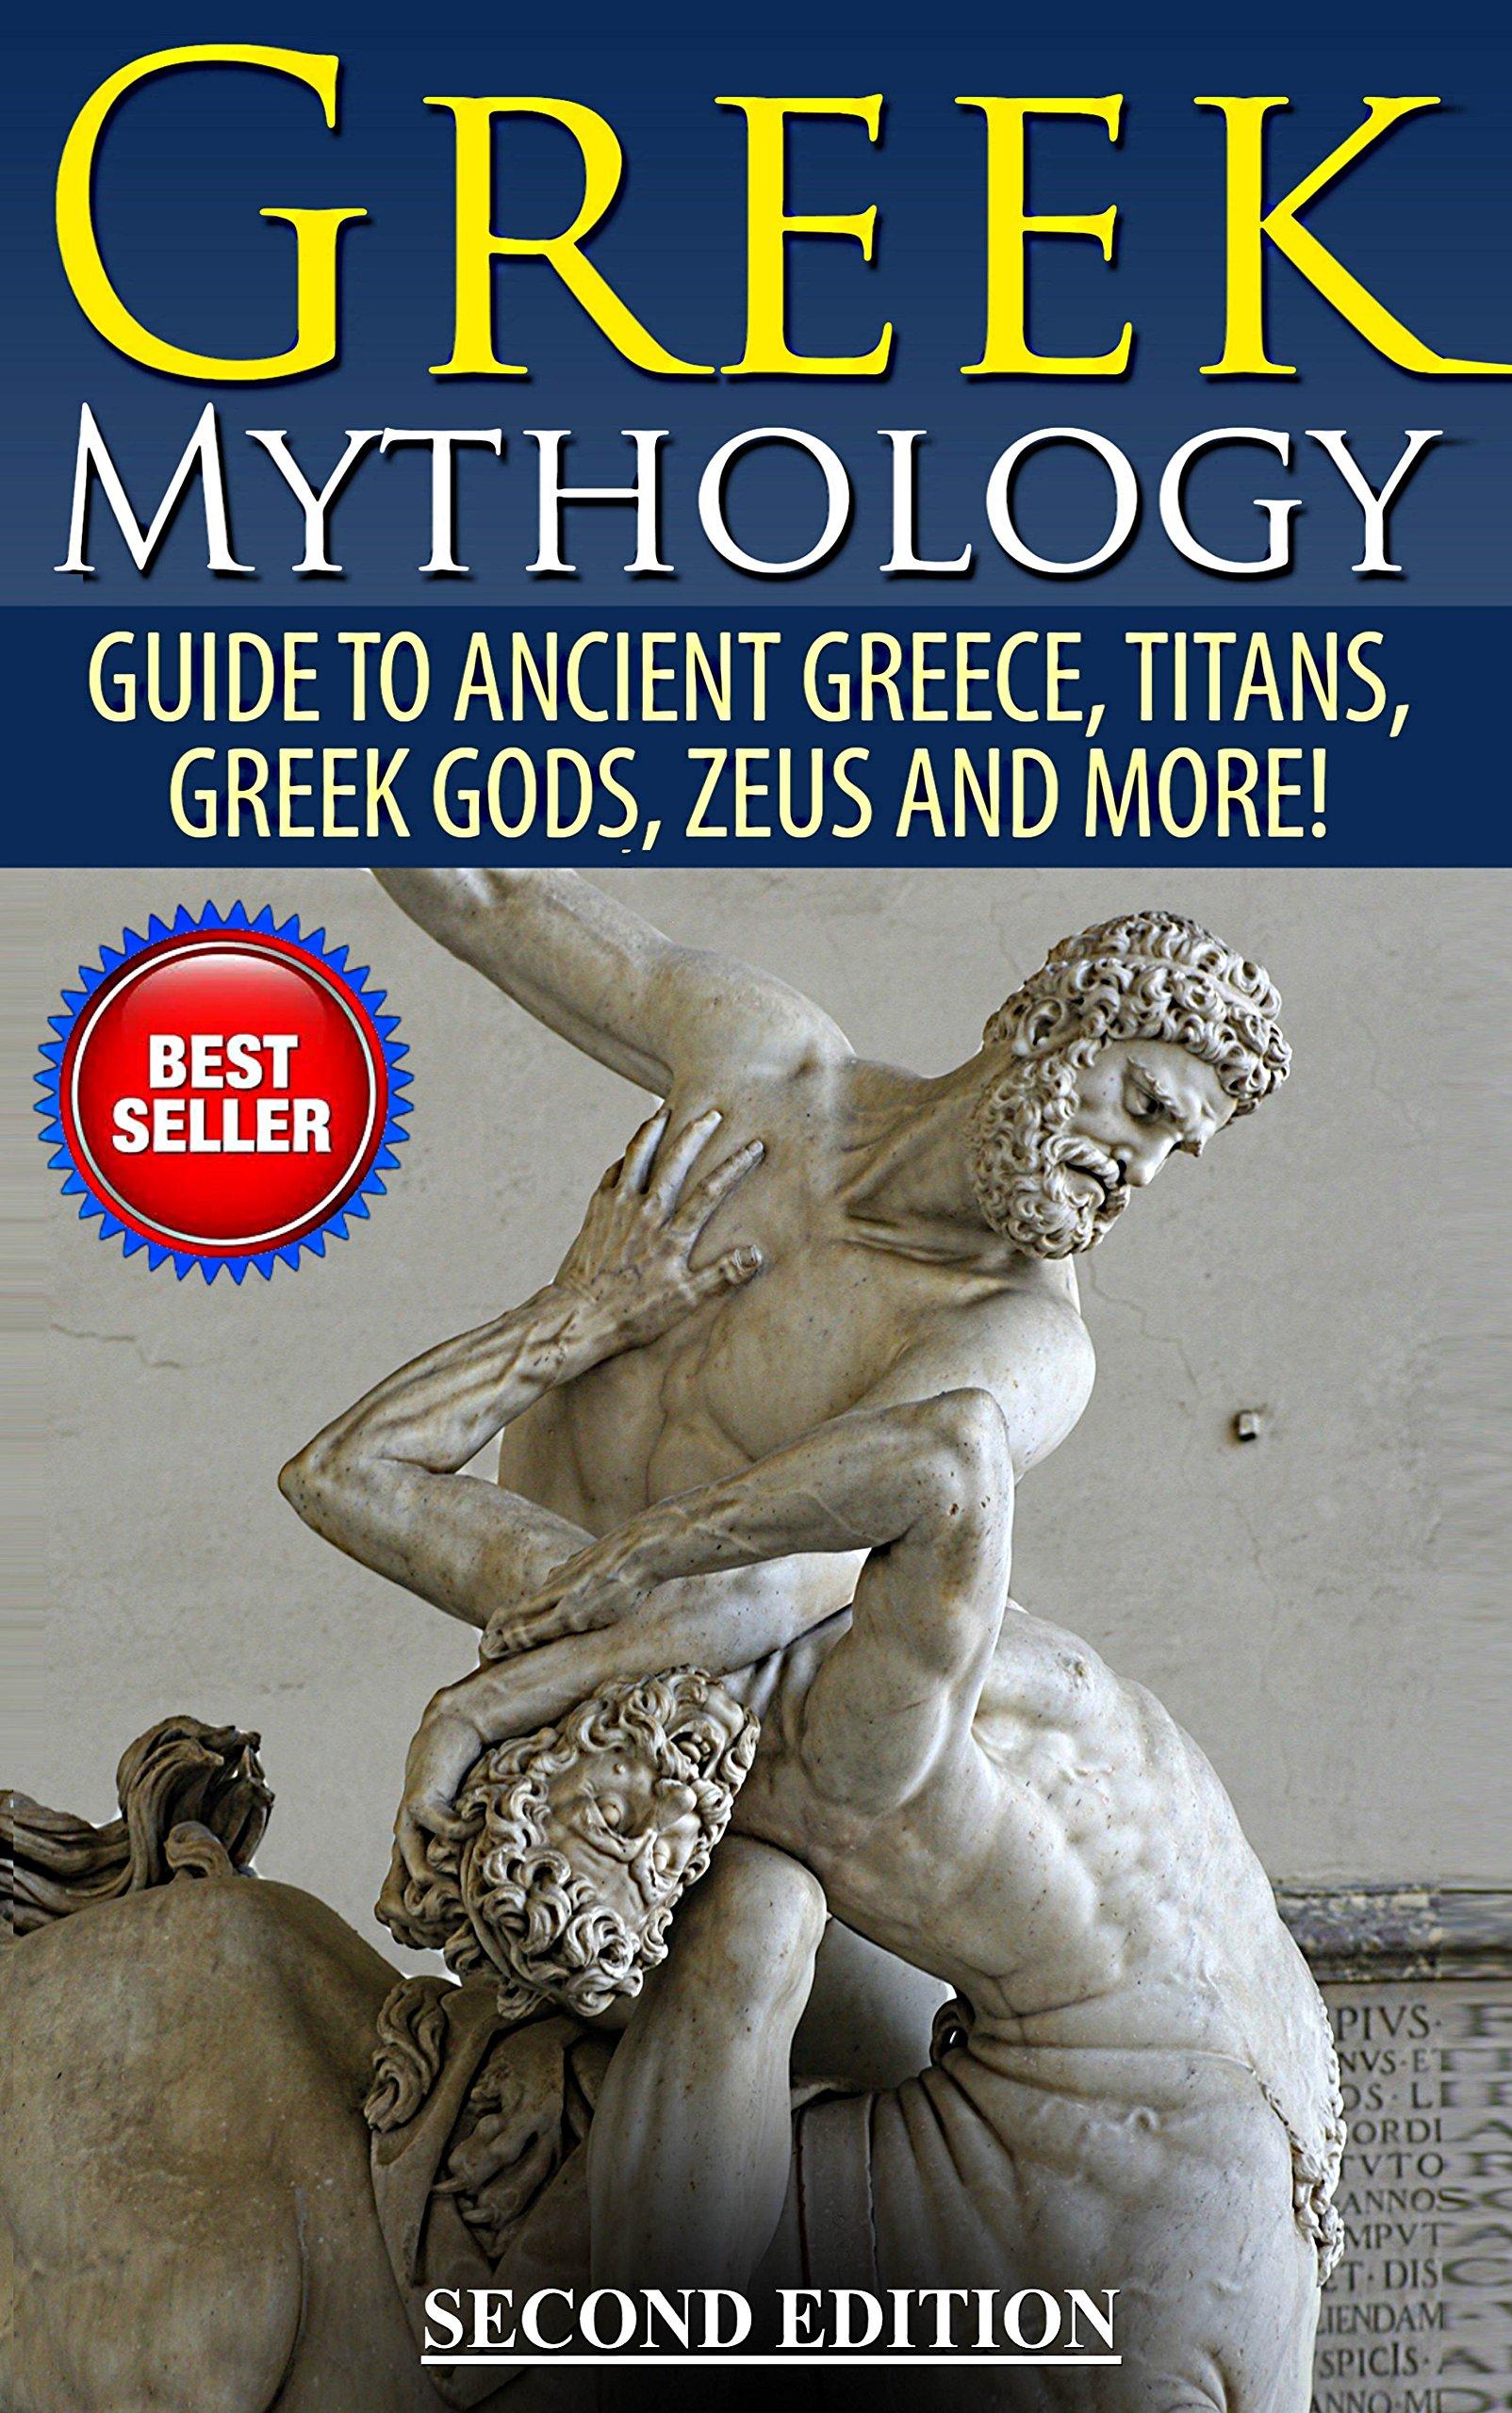 Greek Mythology: Guide To Ancient Greece Titans Greek Gods Zeus and More! (Viking Mythology Hercules Ancient Civilizations) (English Edition)